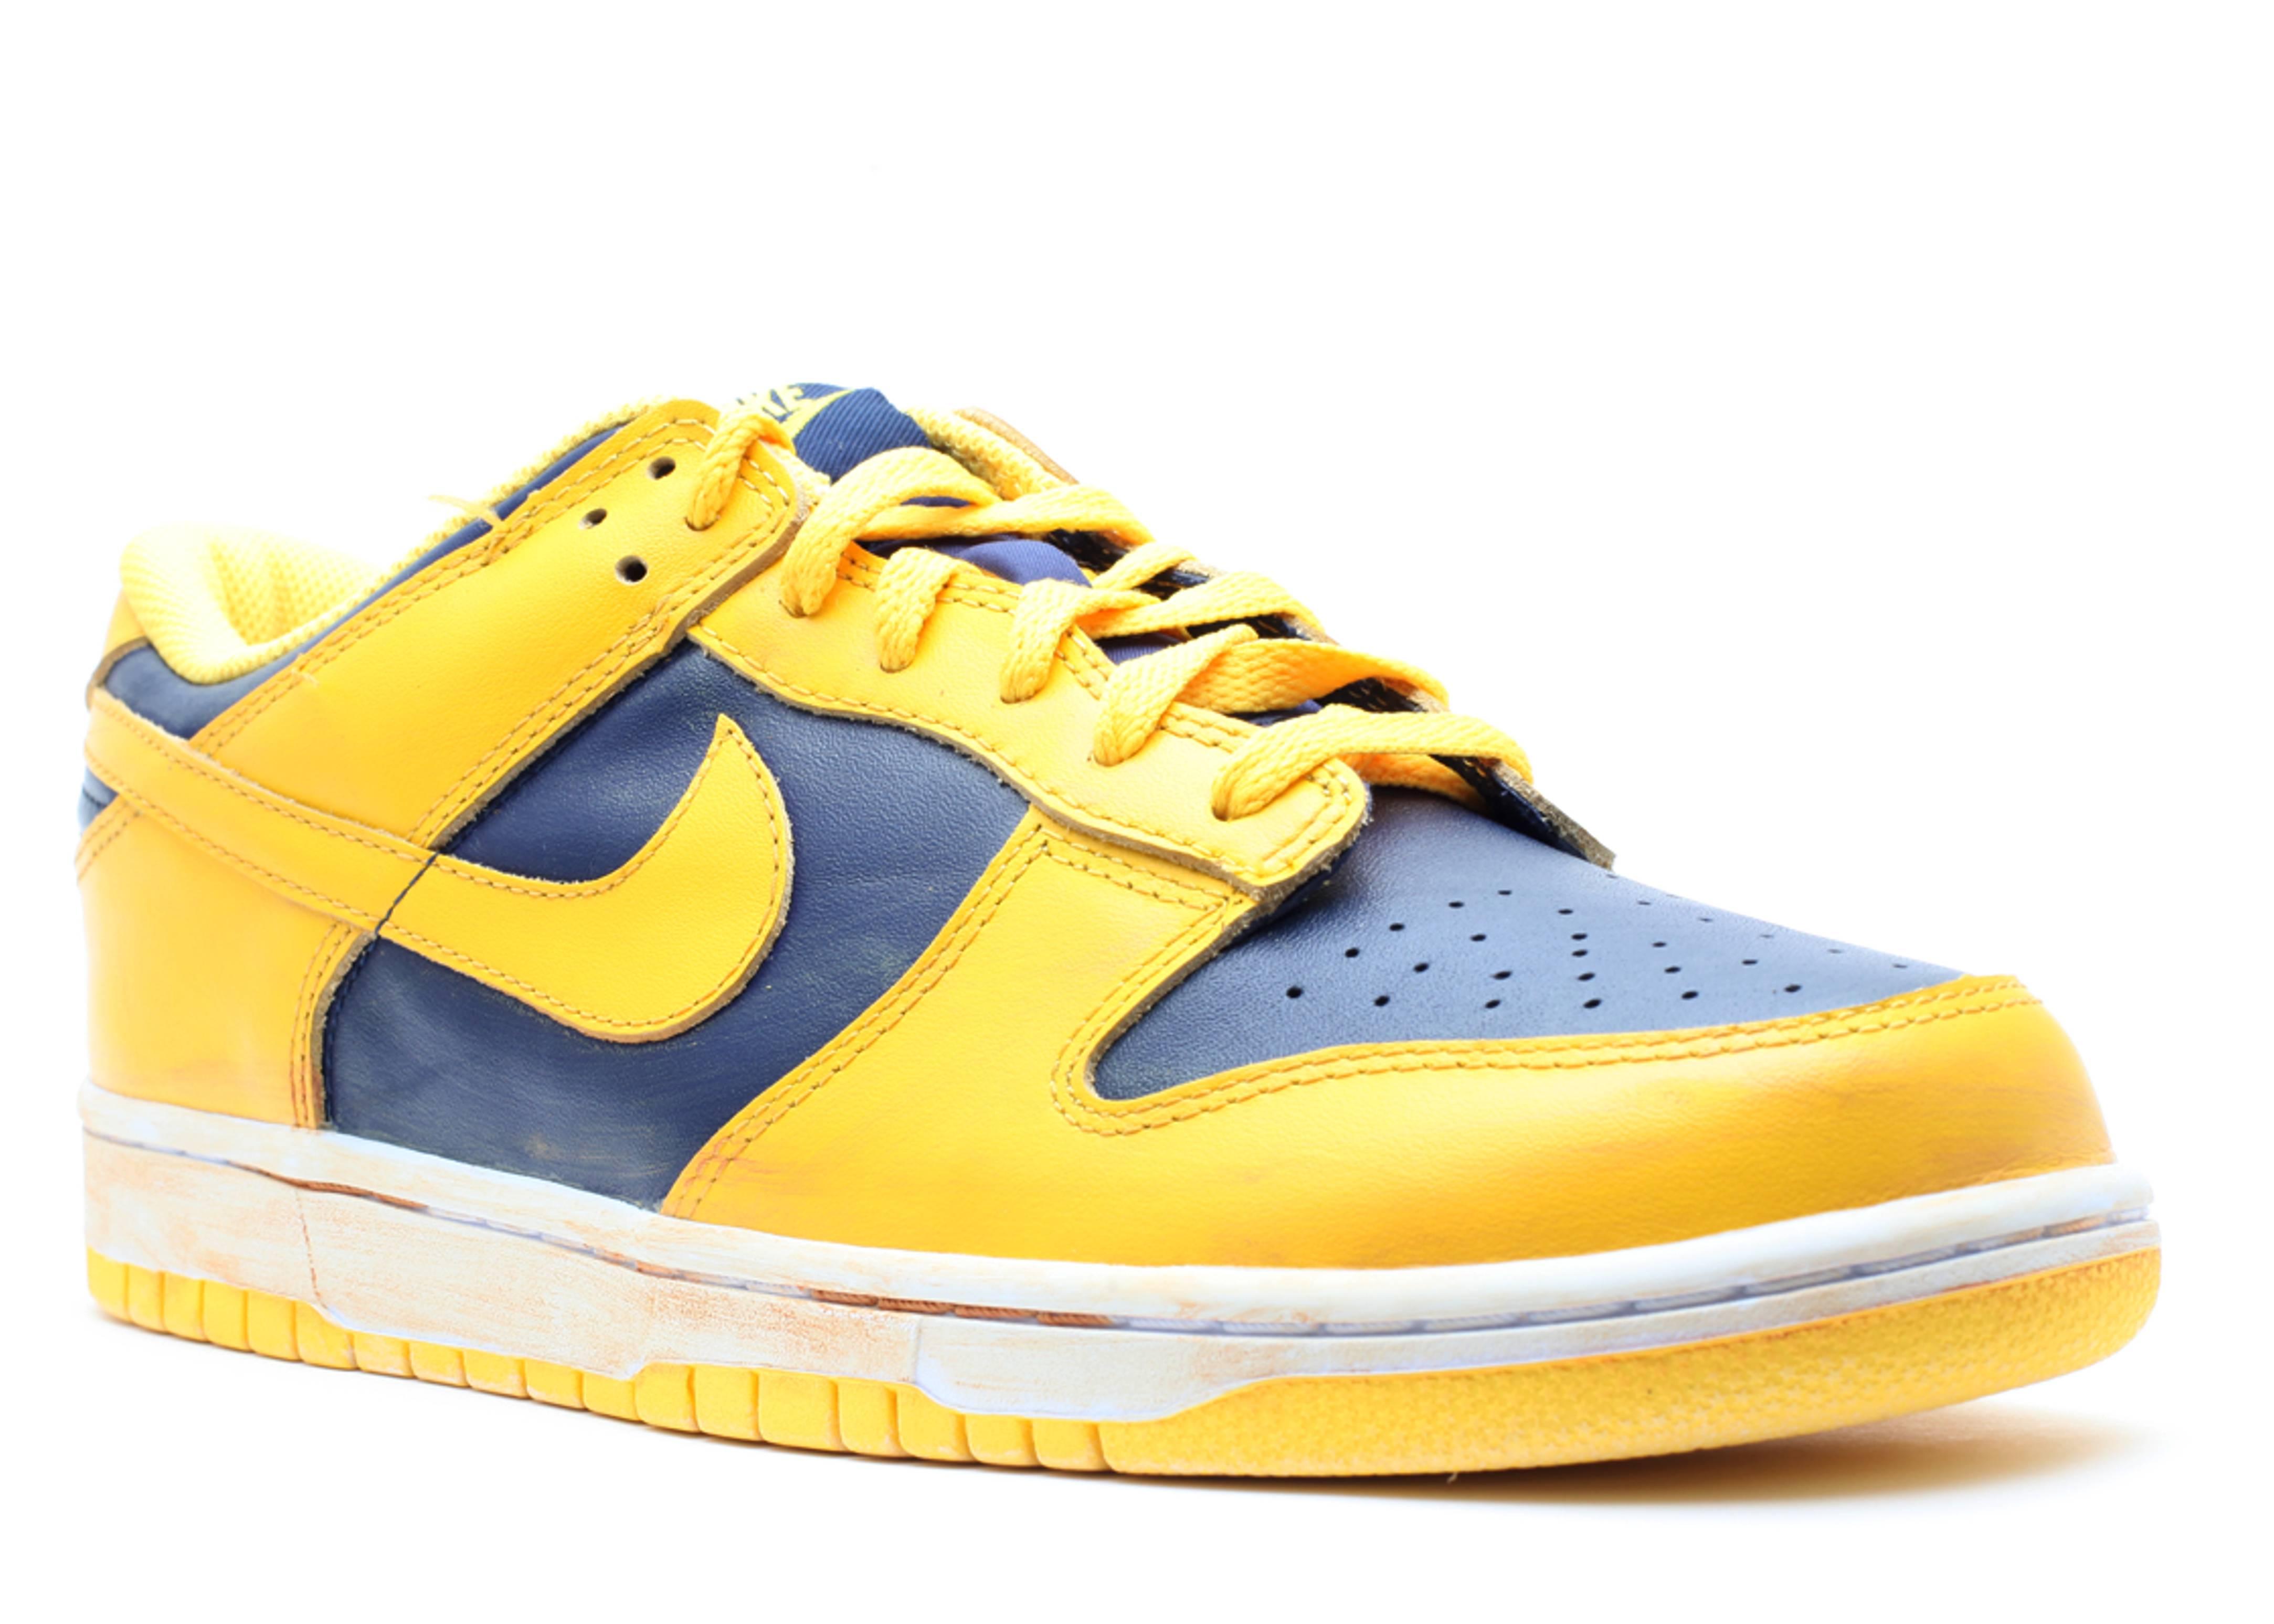 buy popular 96b6b e46c7 Dunk Low Vntg - Nike - 446242 700 - varisty maize/midnight navy ...